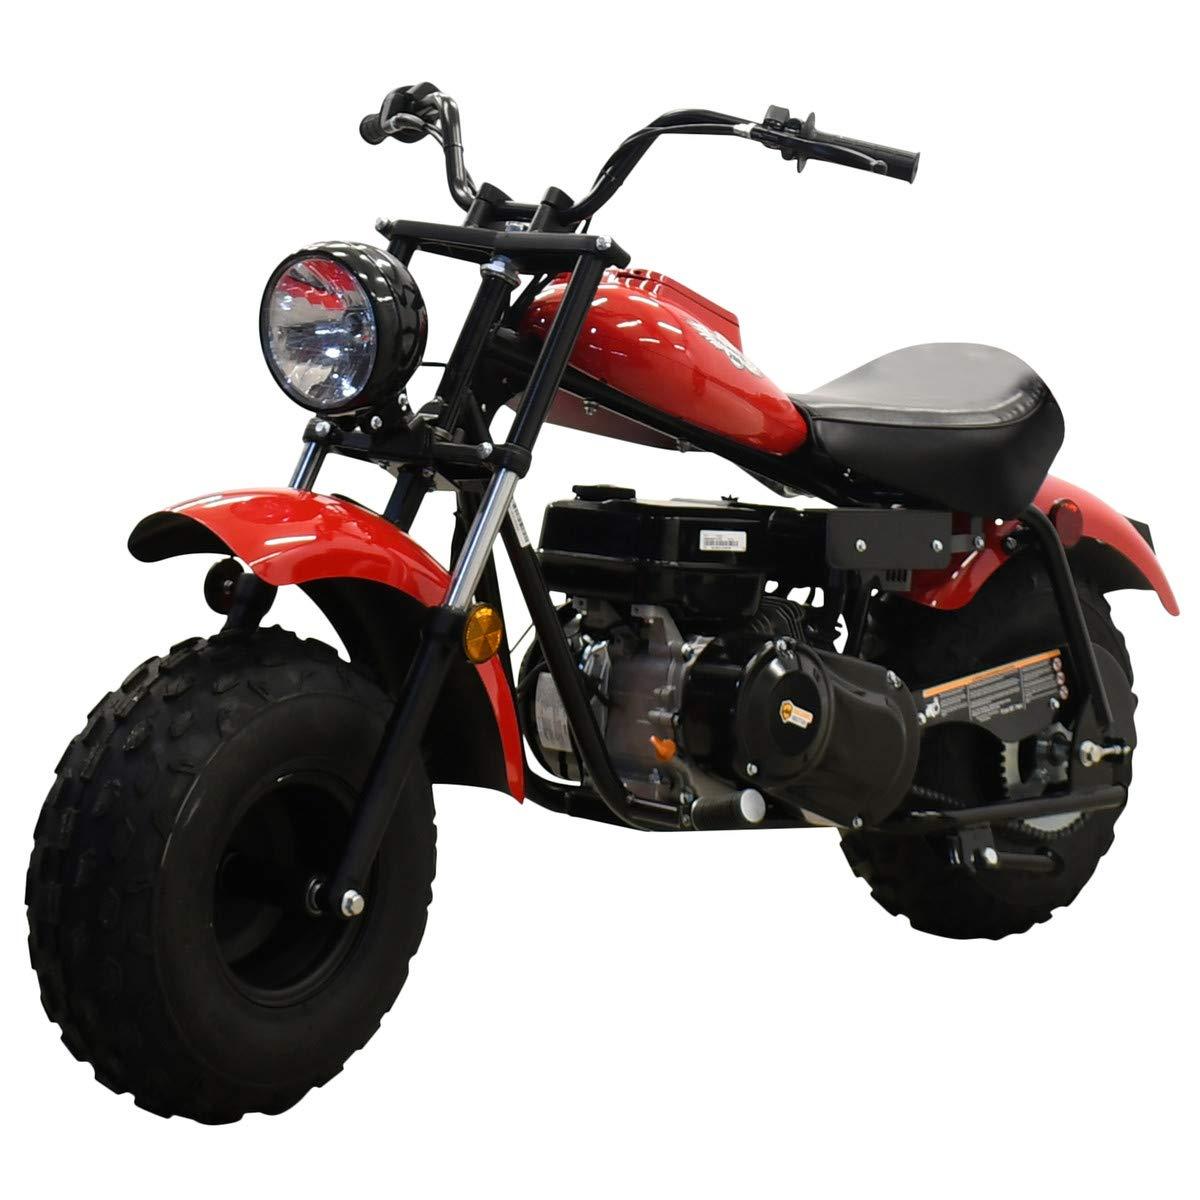 X-PRO MB200 Supersized 196CC Youth Mini Bike Gas Powered